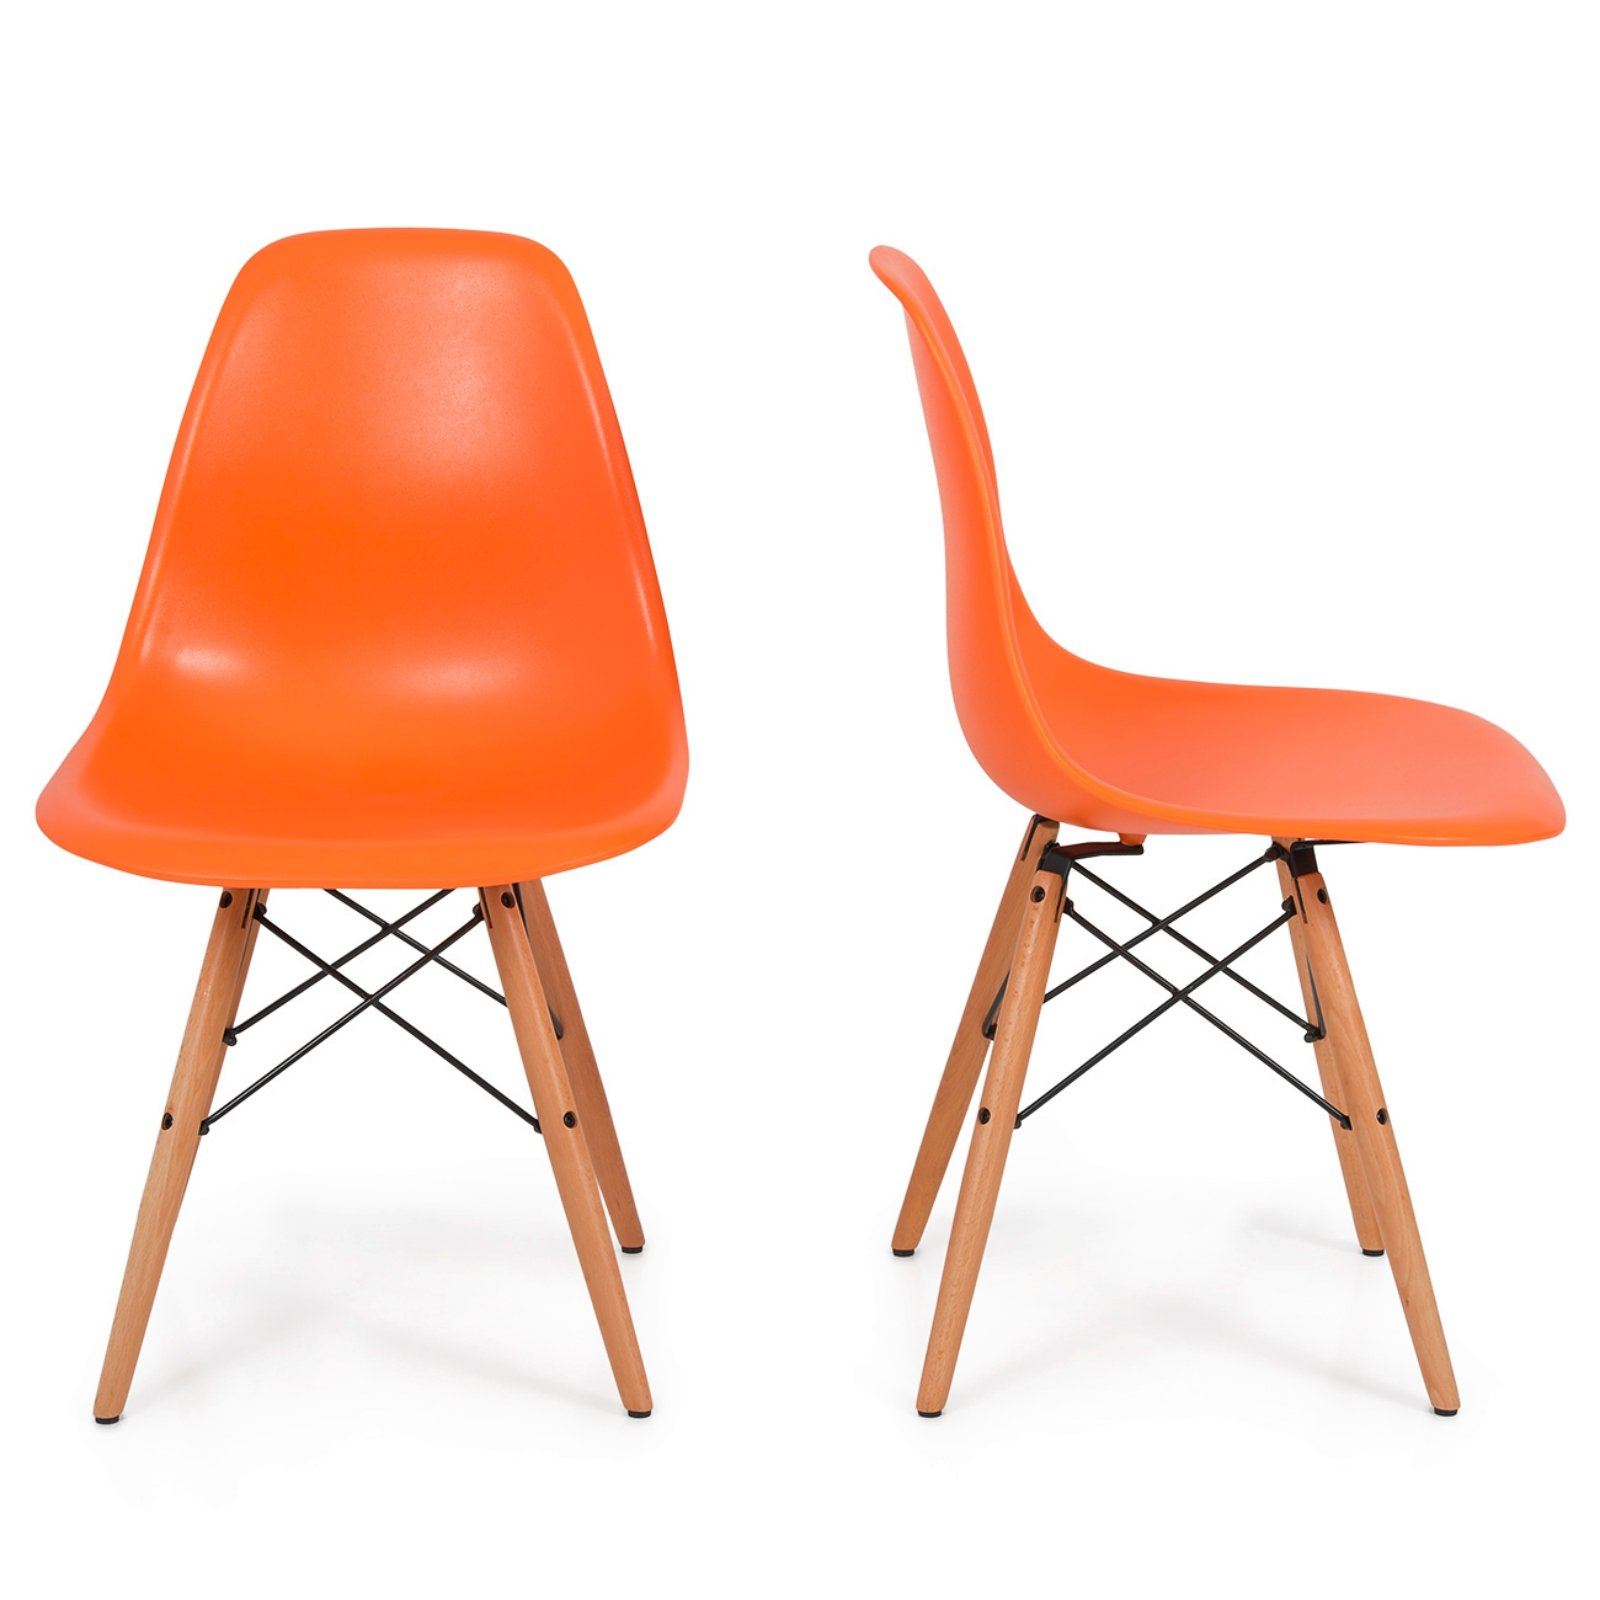 Set of 2 Retro Style Wood Base Mid Century Modern Shell Dining wooden Chair Dowel legs Orange #566